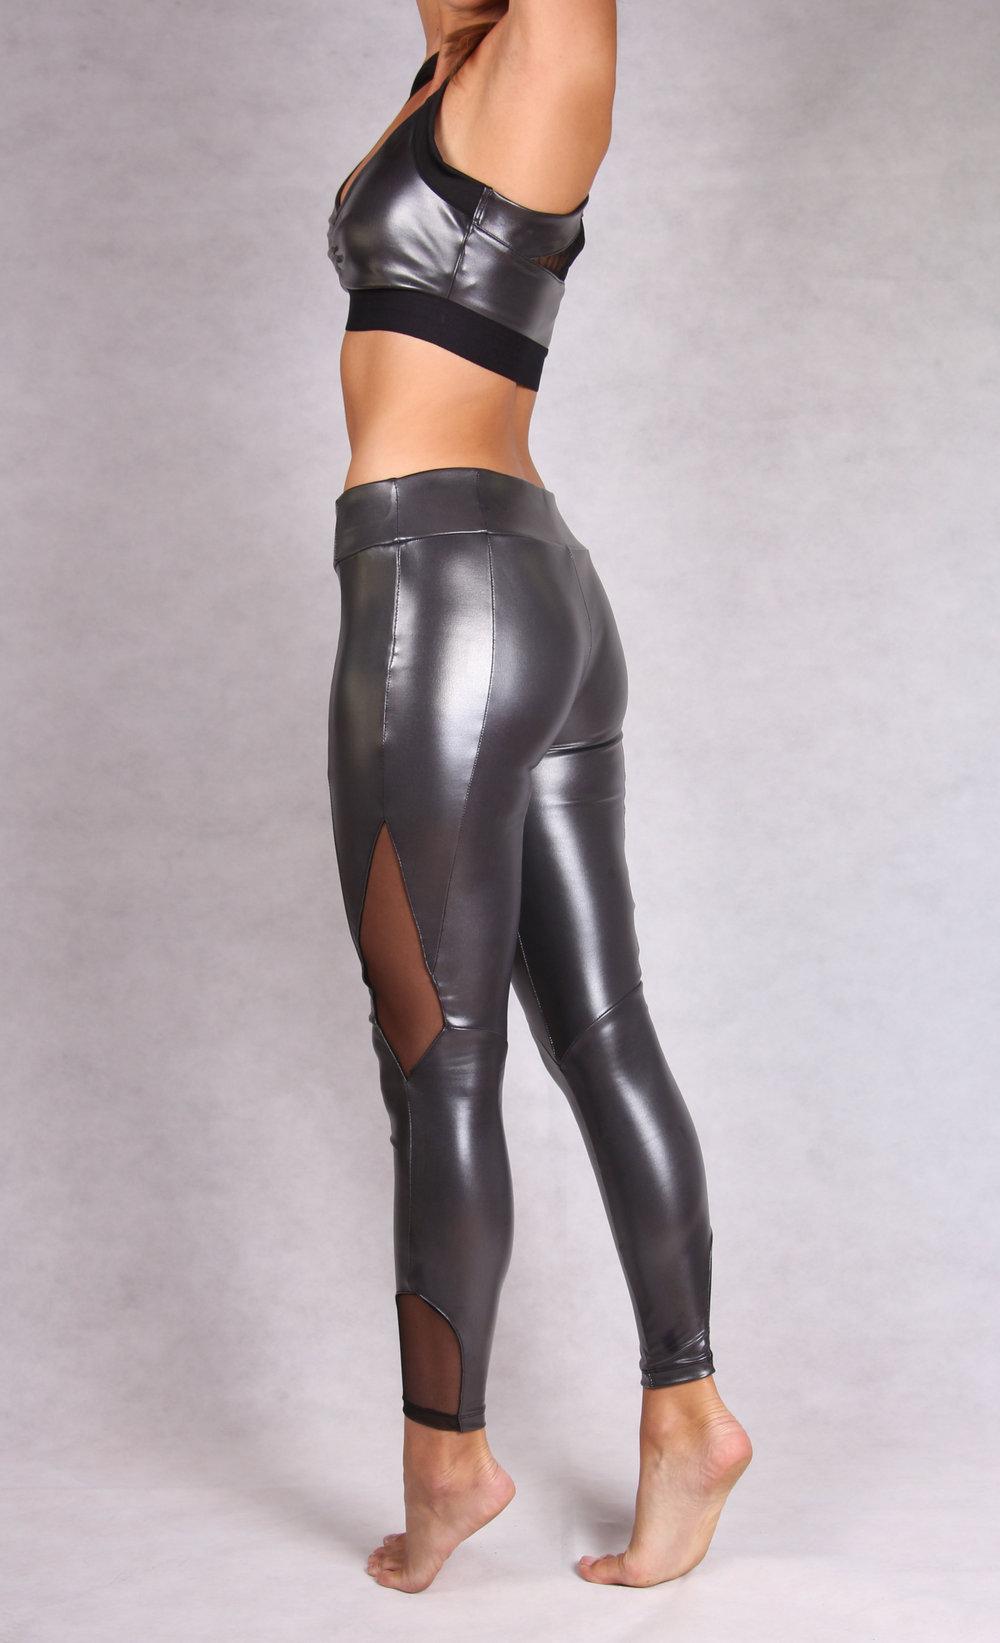 e8ba2377ef40fc WET LOOK LEG - 7/8 MESH DETAIL WET LOOK LEGGING — Kisaiya | Yoga Wear |  Yoga Clothes | Yoga Activewear for Women | Yoga Clothes for Women